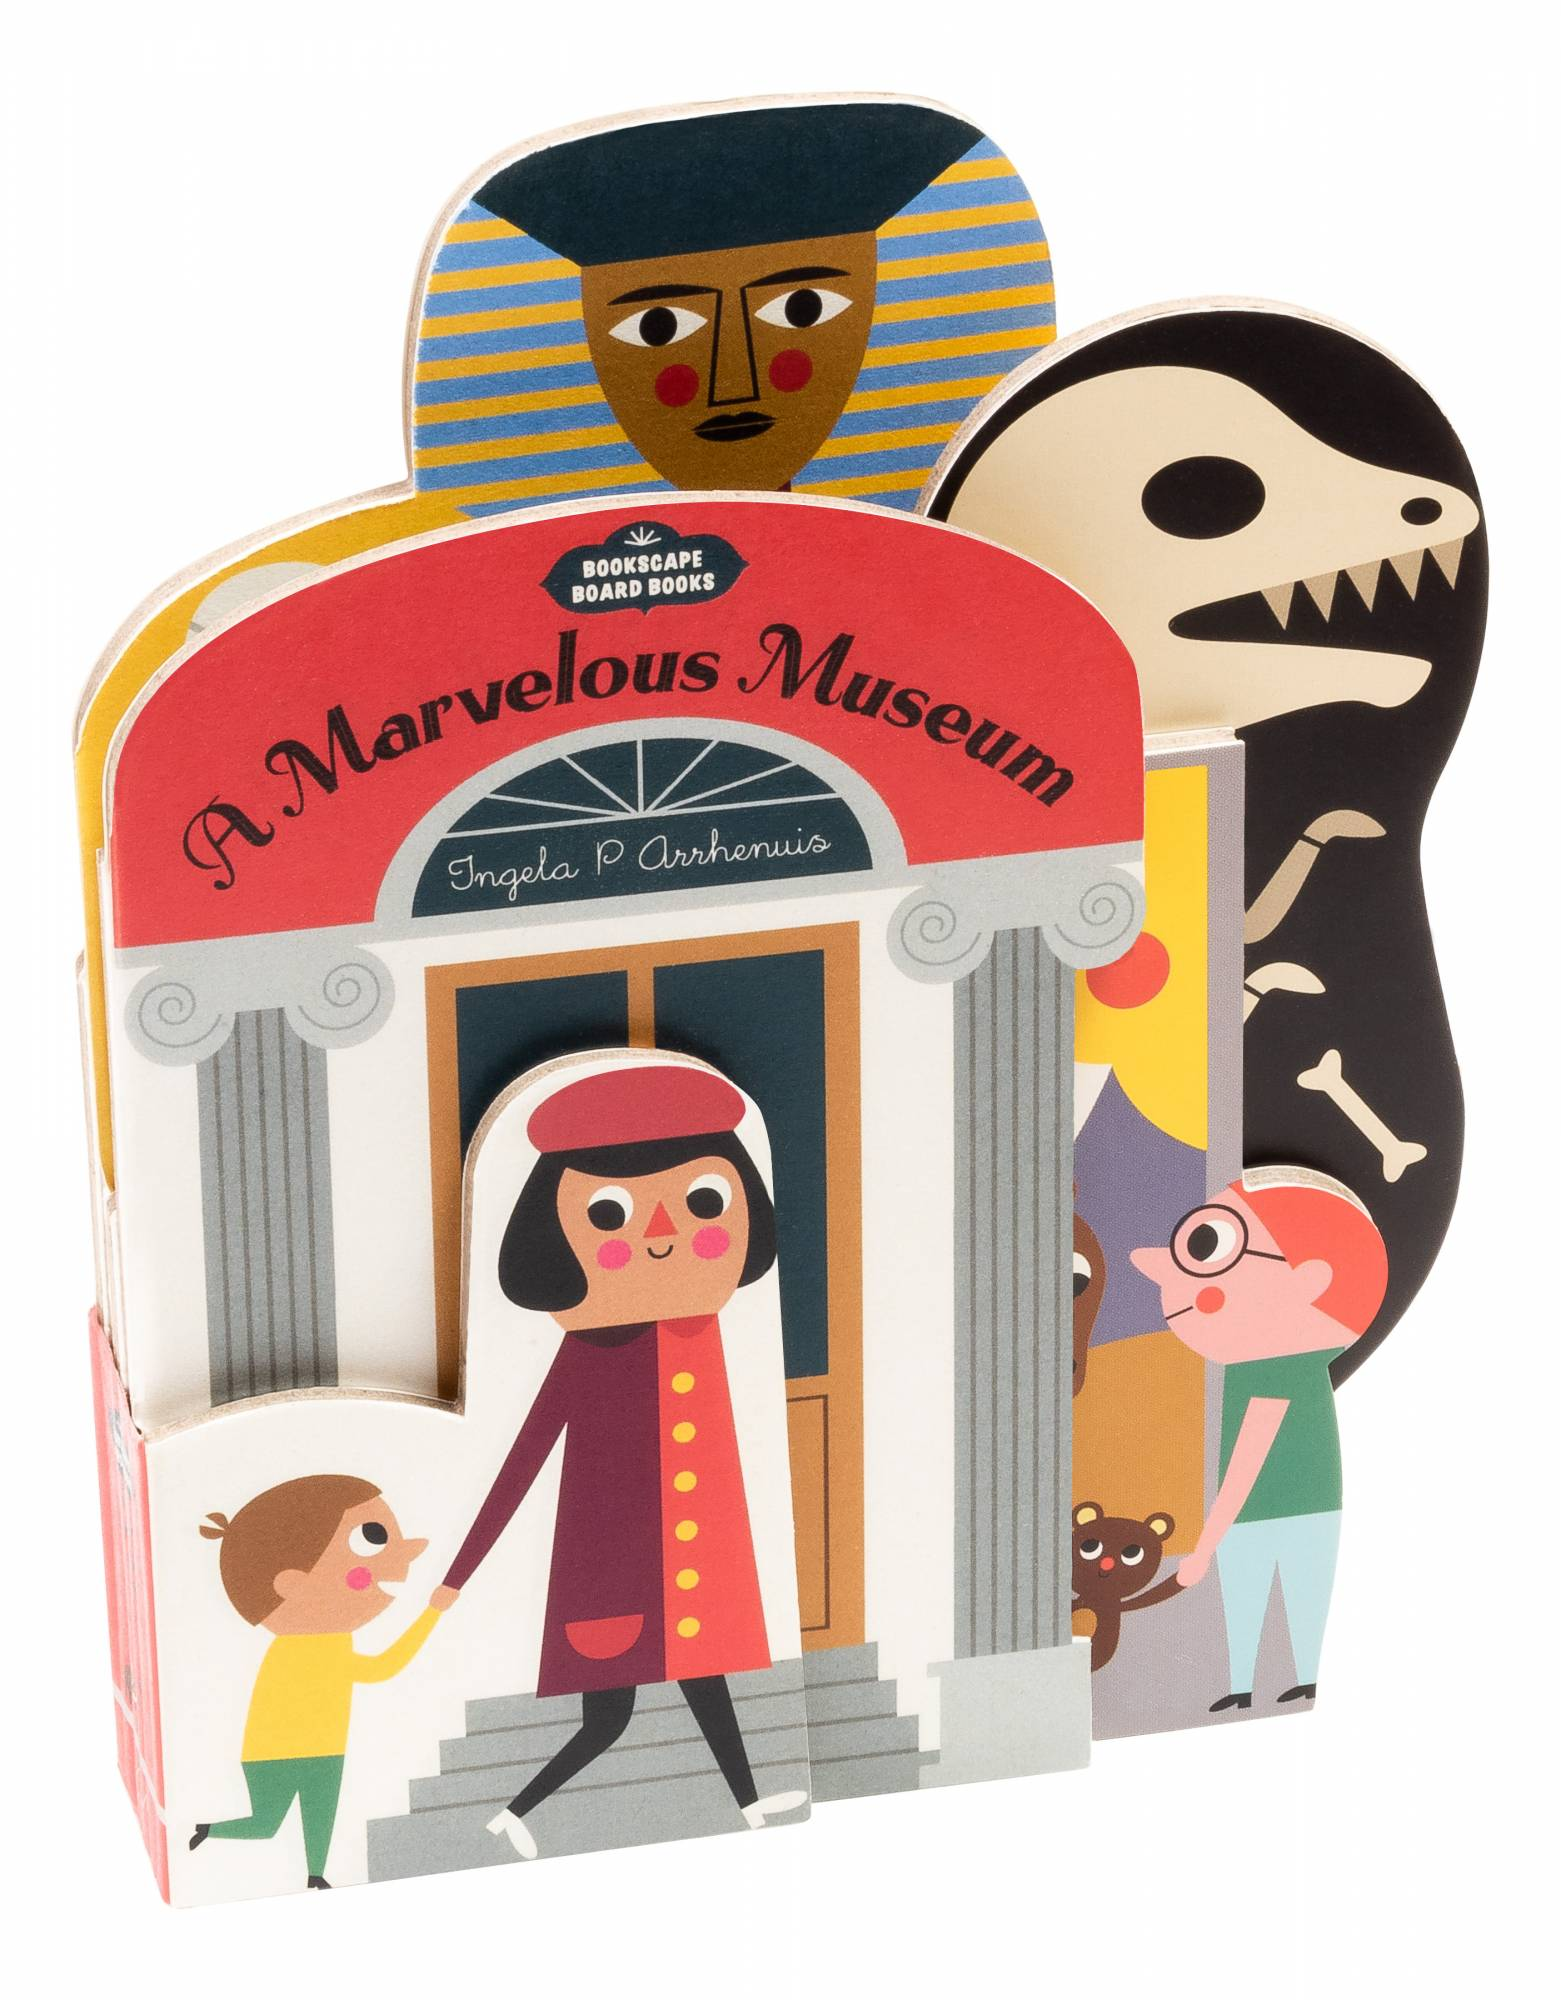 Ingela P Arrhenius - Bookscape Board Books: A Marvelous Museum